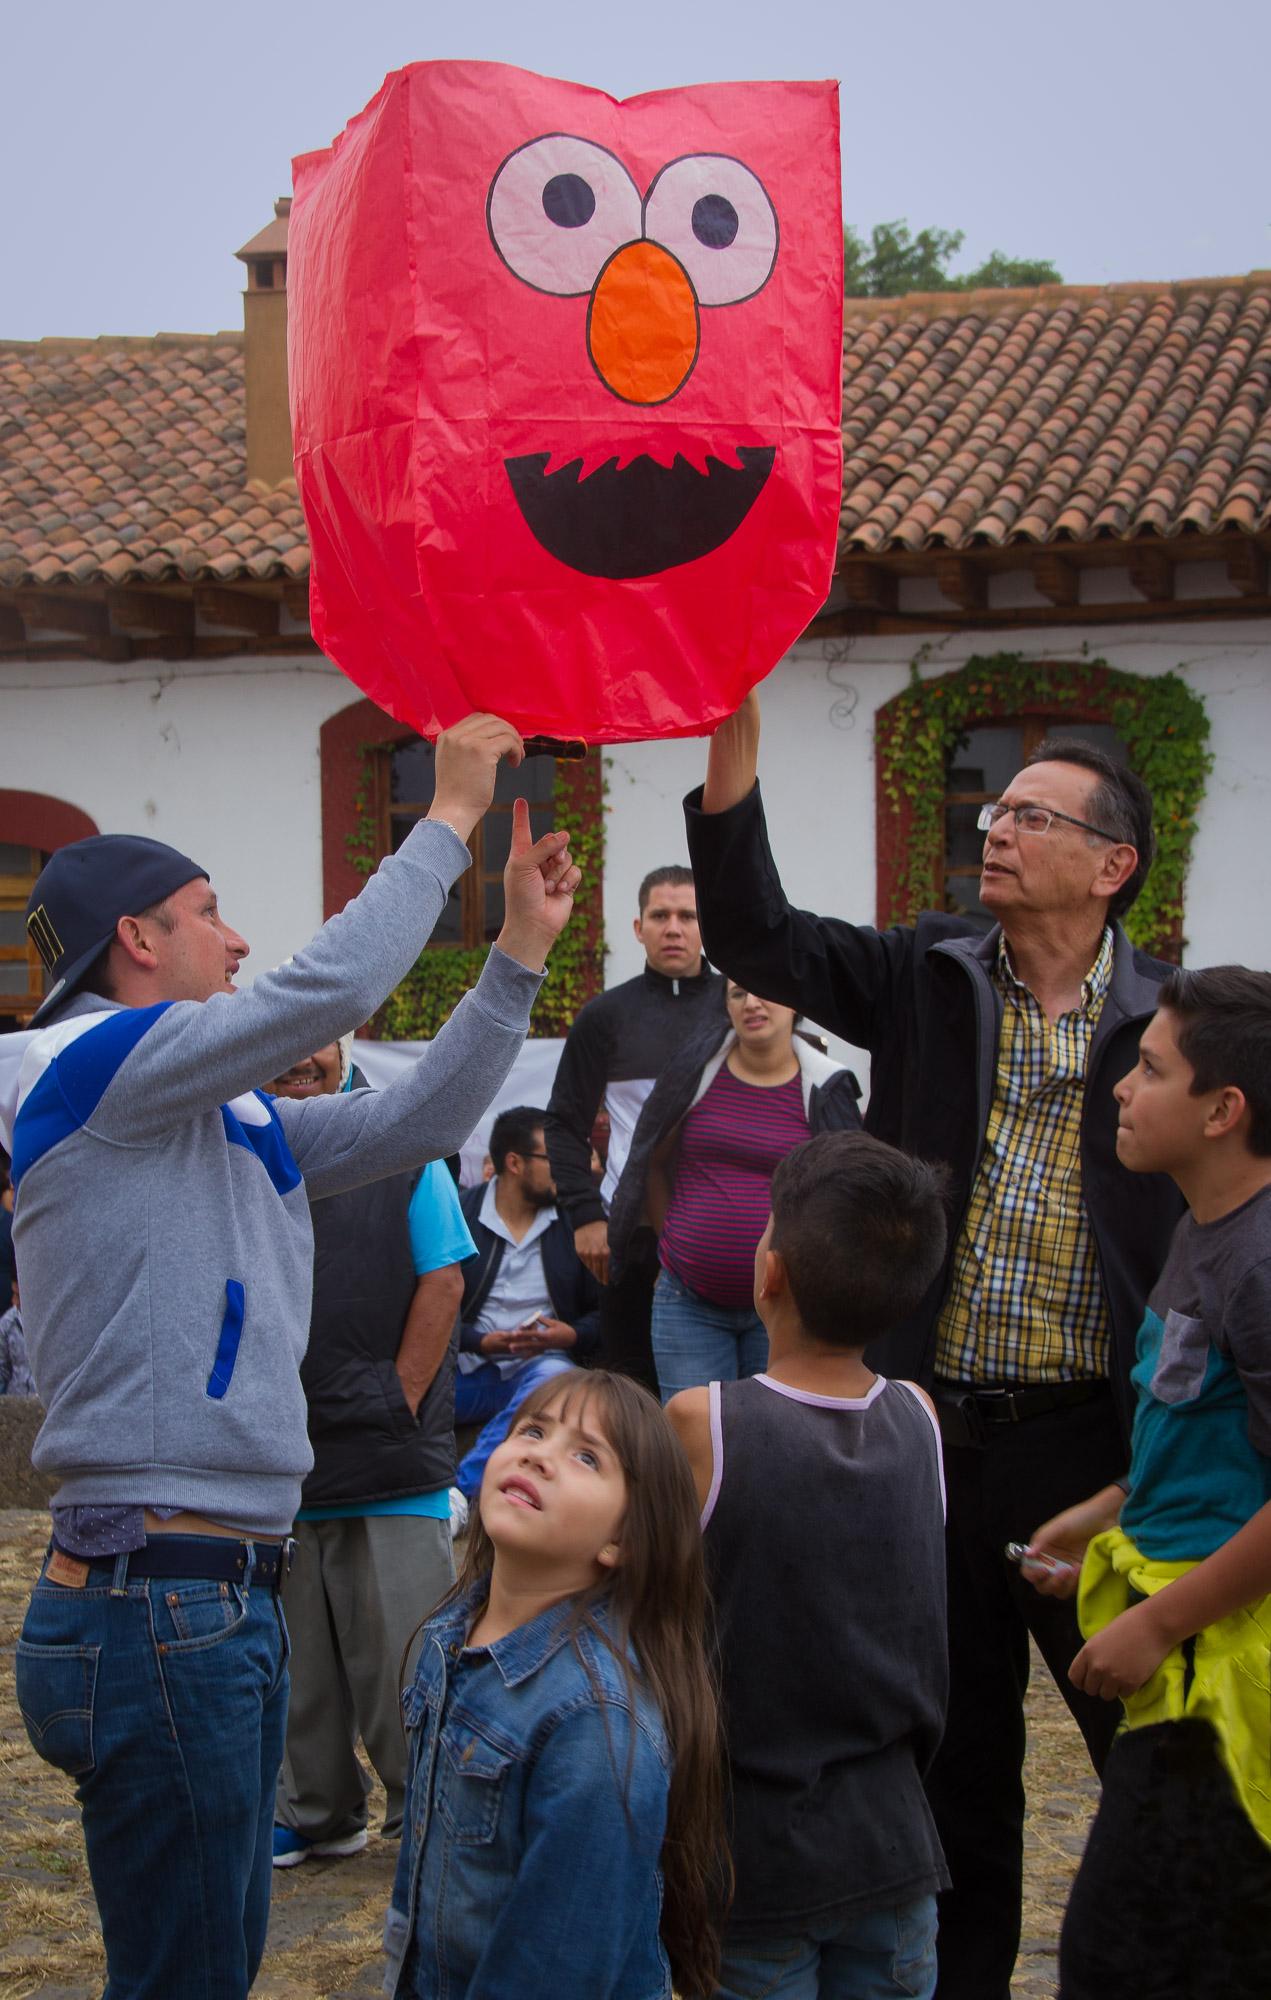 Tickle Me   CantoyaFest: Pátzcuaro, Michoacán, Mexico — Sunday, July 23, 2017